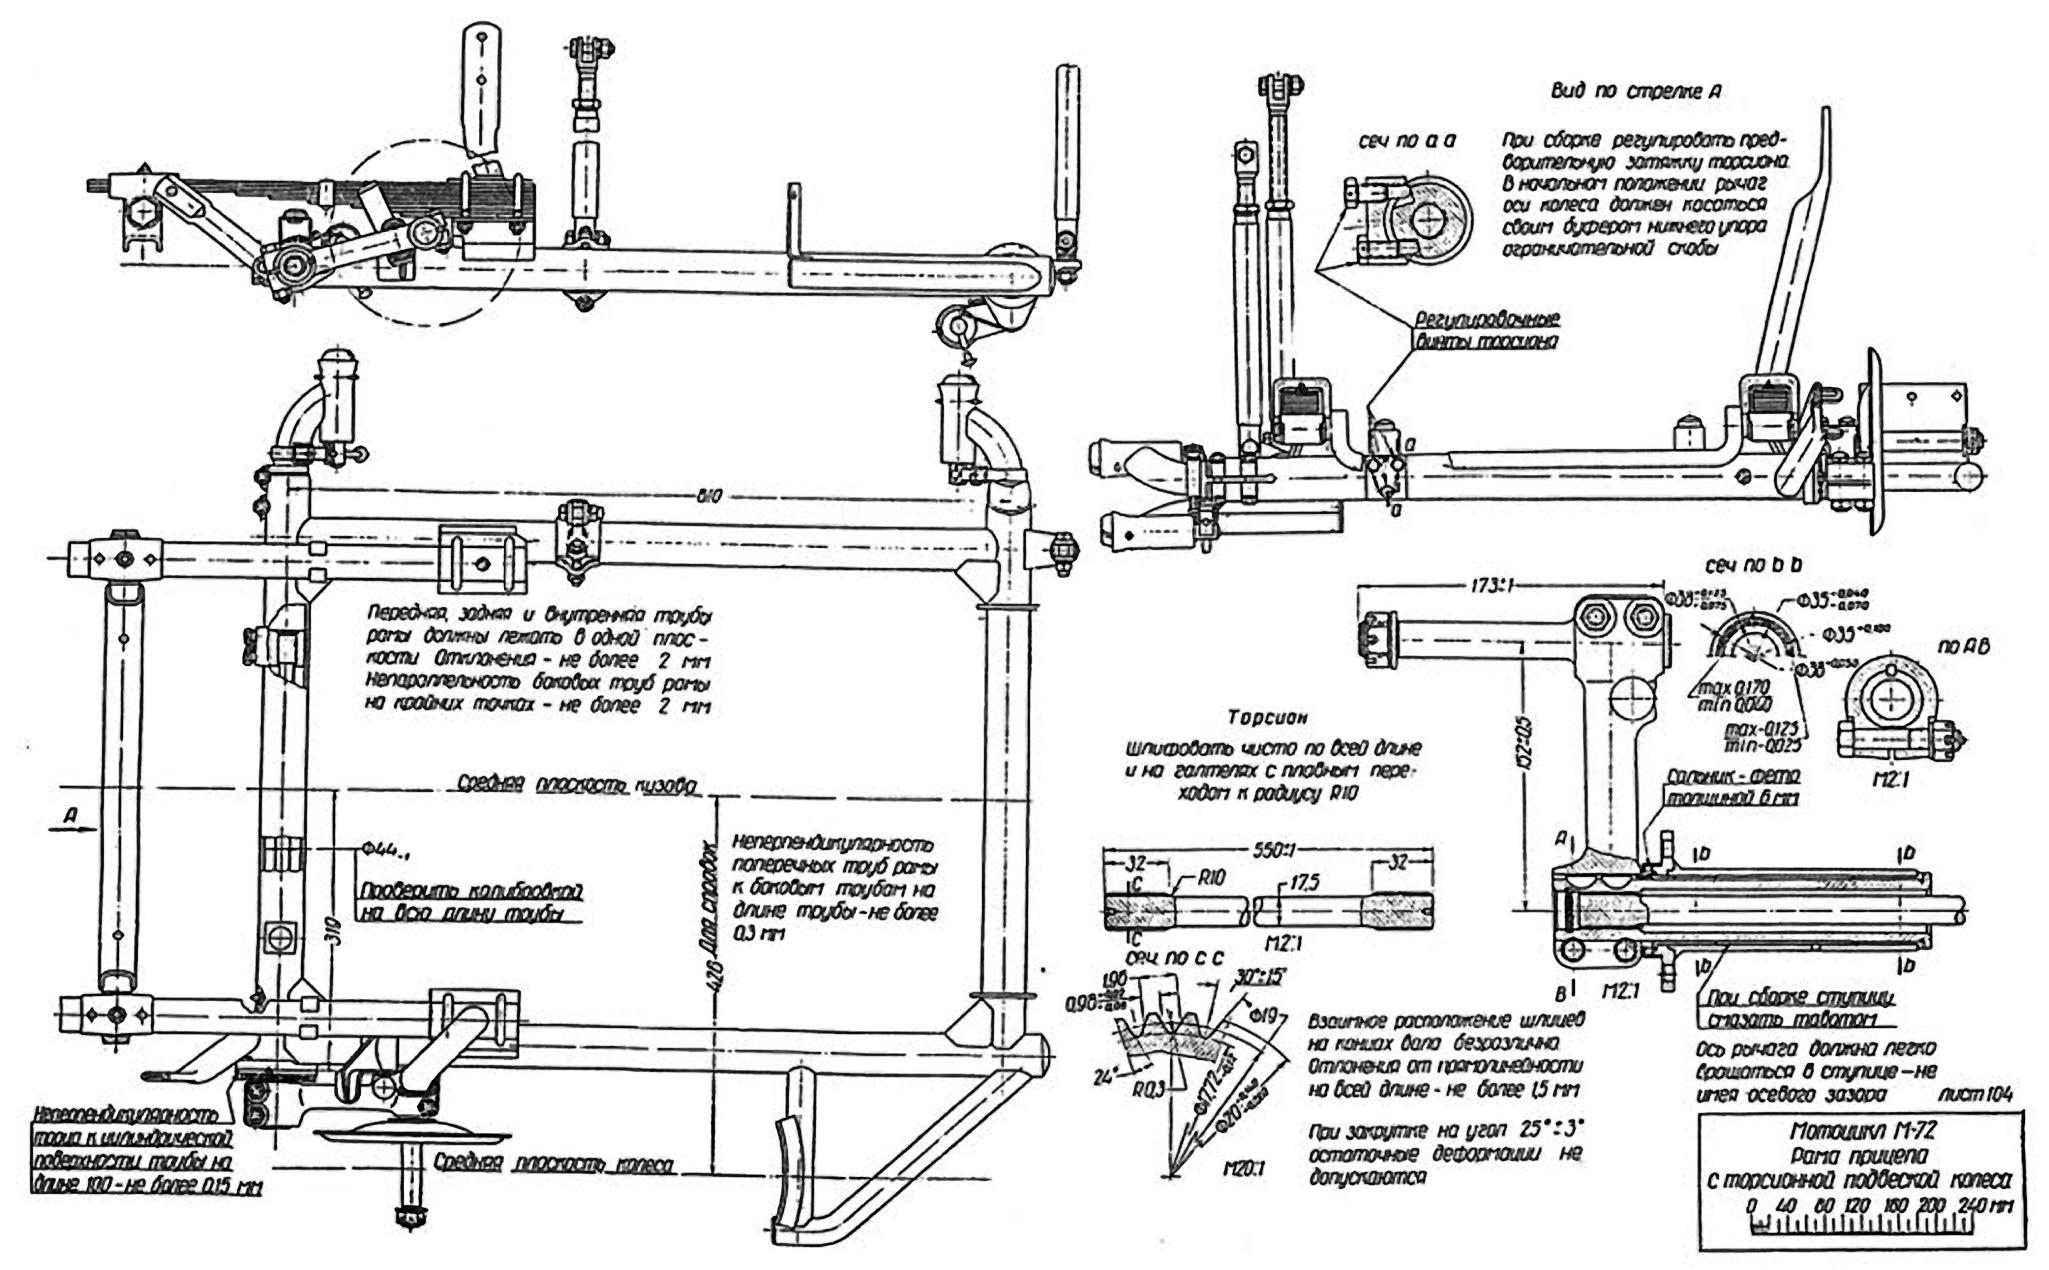 Delightful Sidecar Blueprints #10: Sidecar Frame